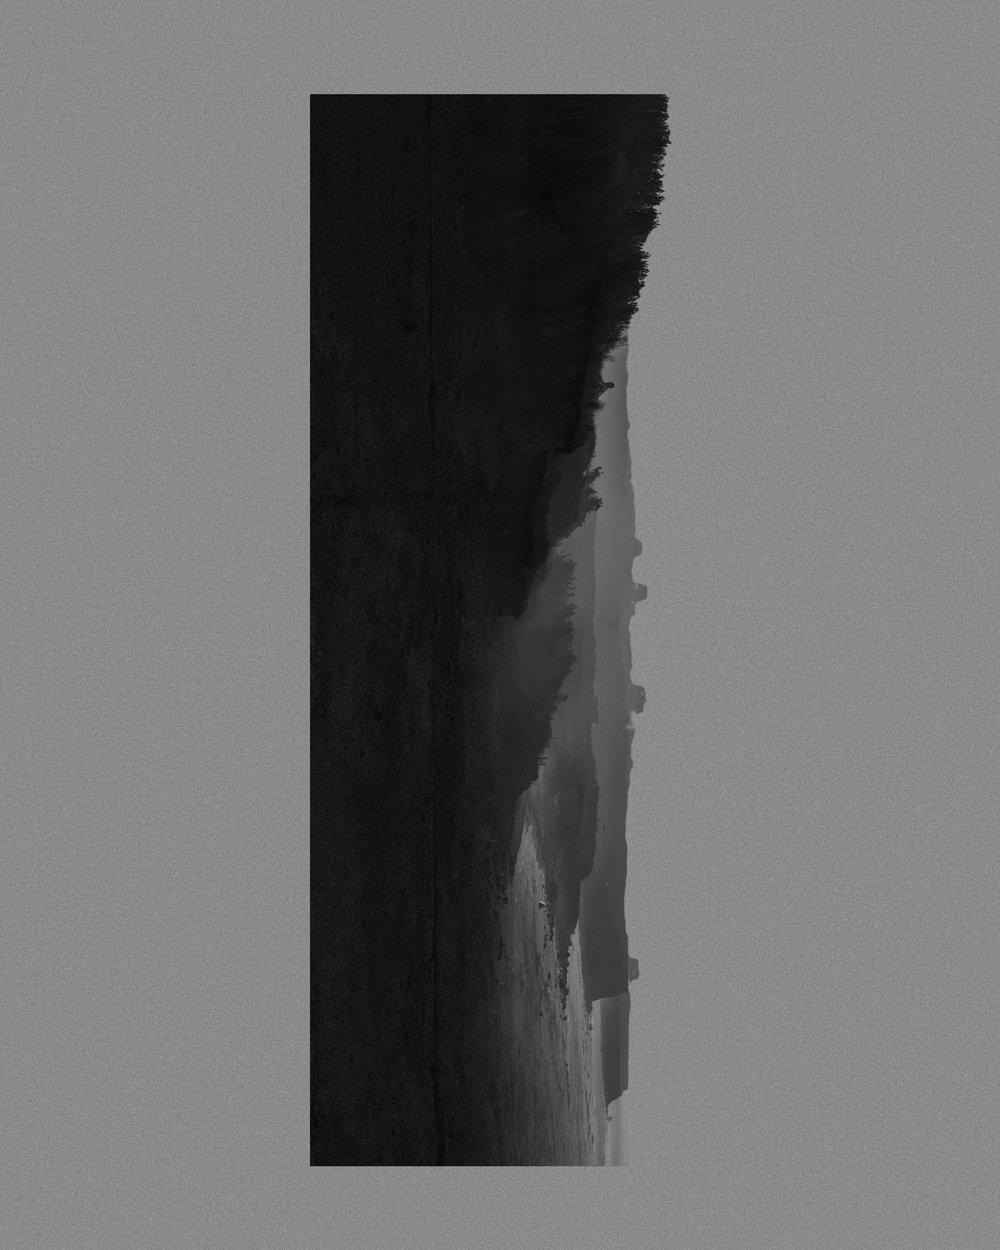 170502-BALUKONISUntitled-1.jpg